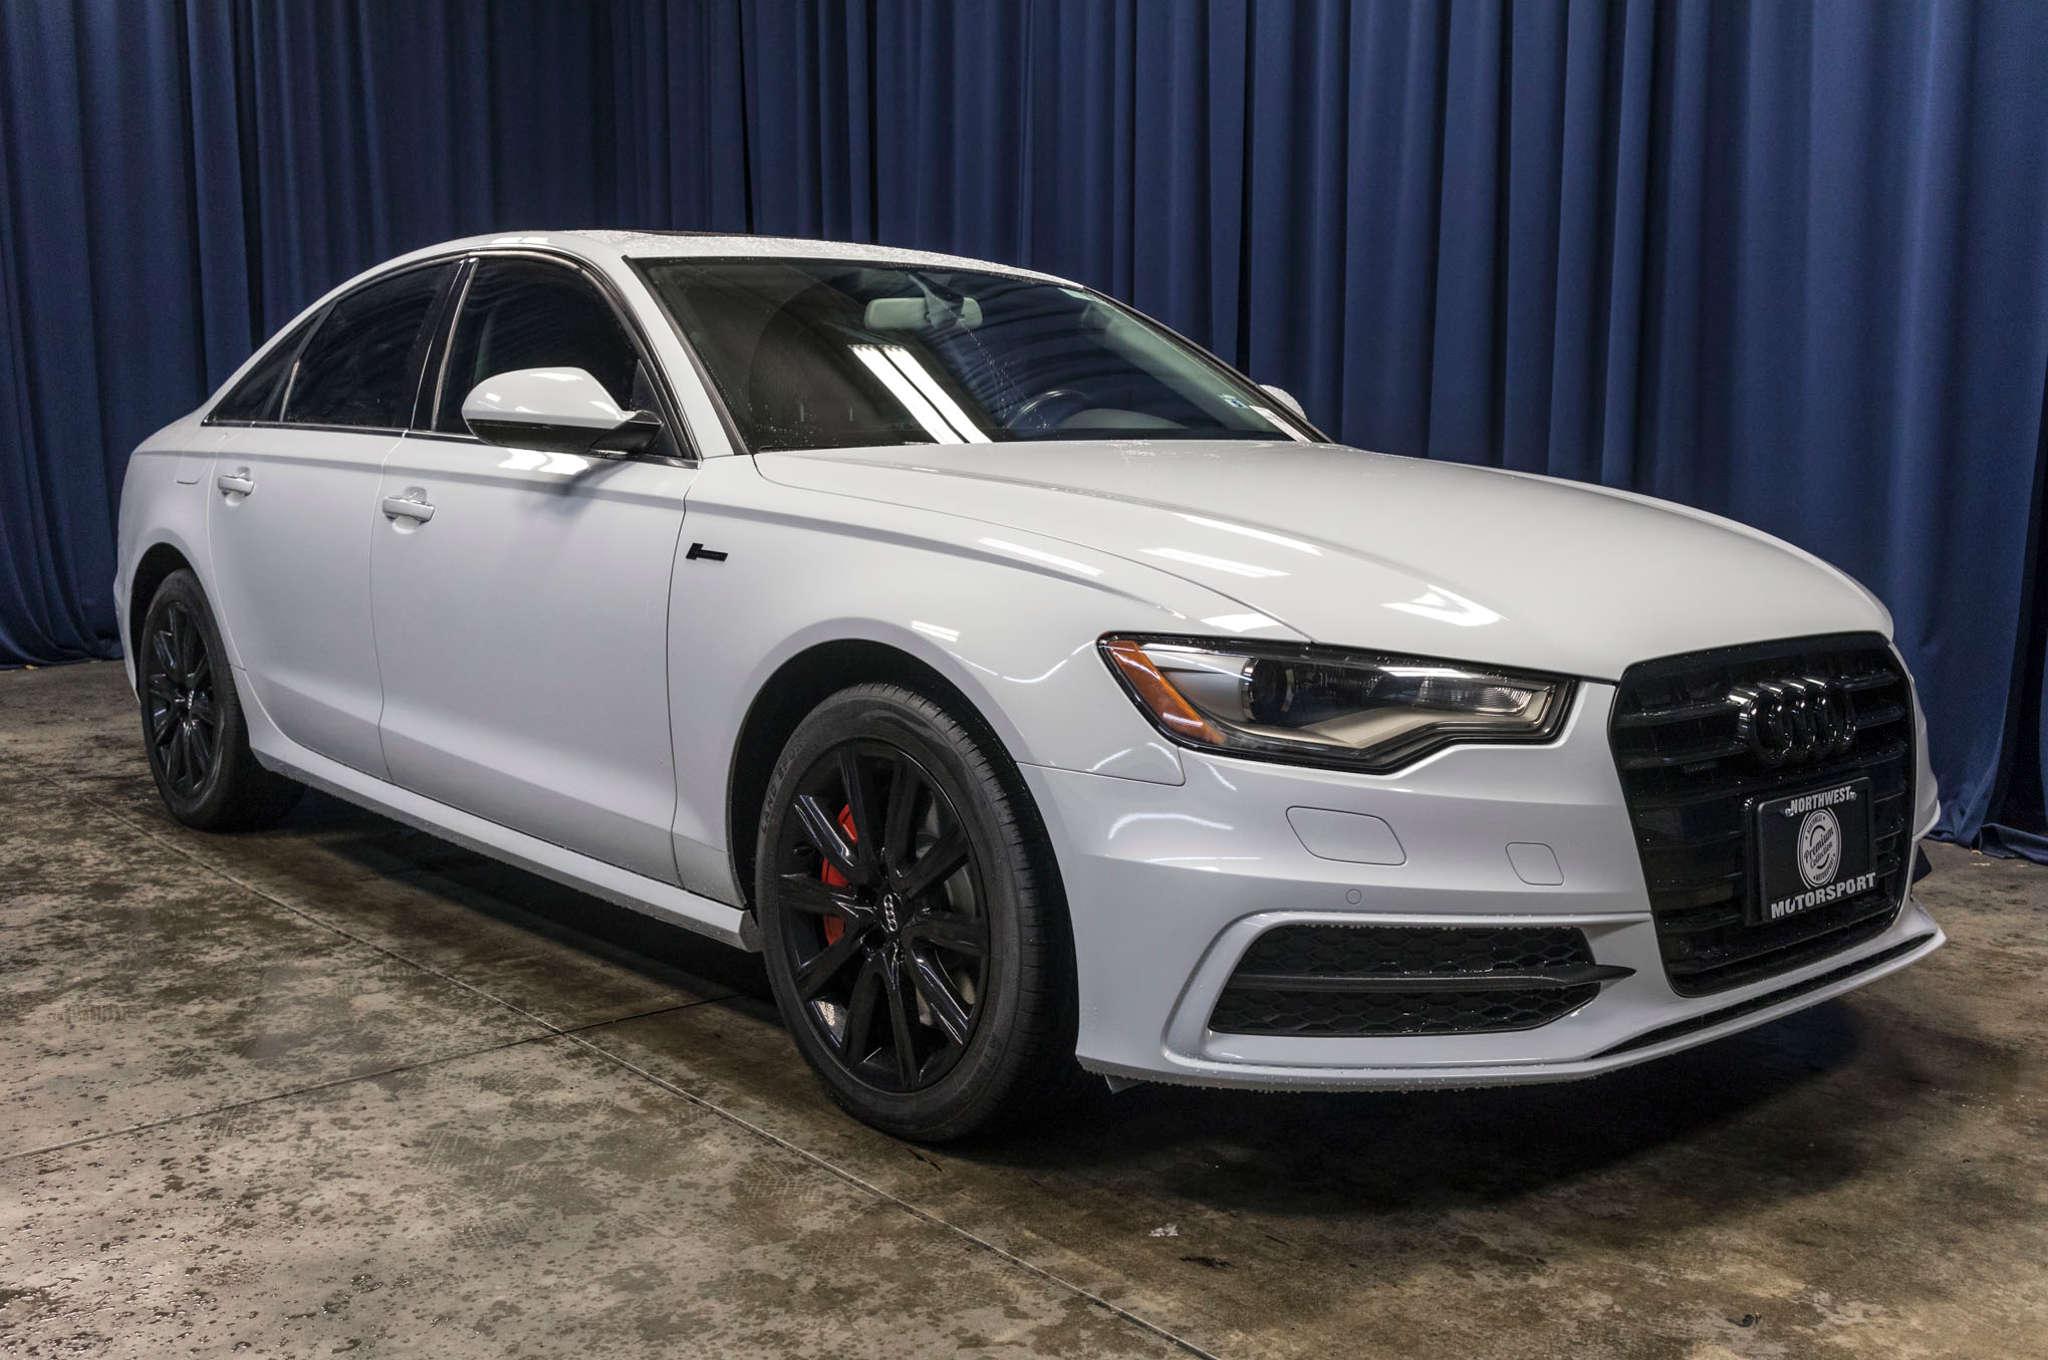 prestige for group inventory at quattro in sale details brunswick auto audi east llc nj